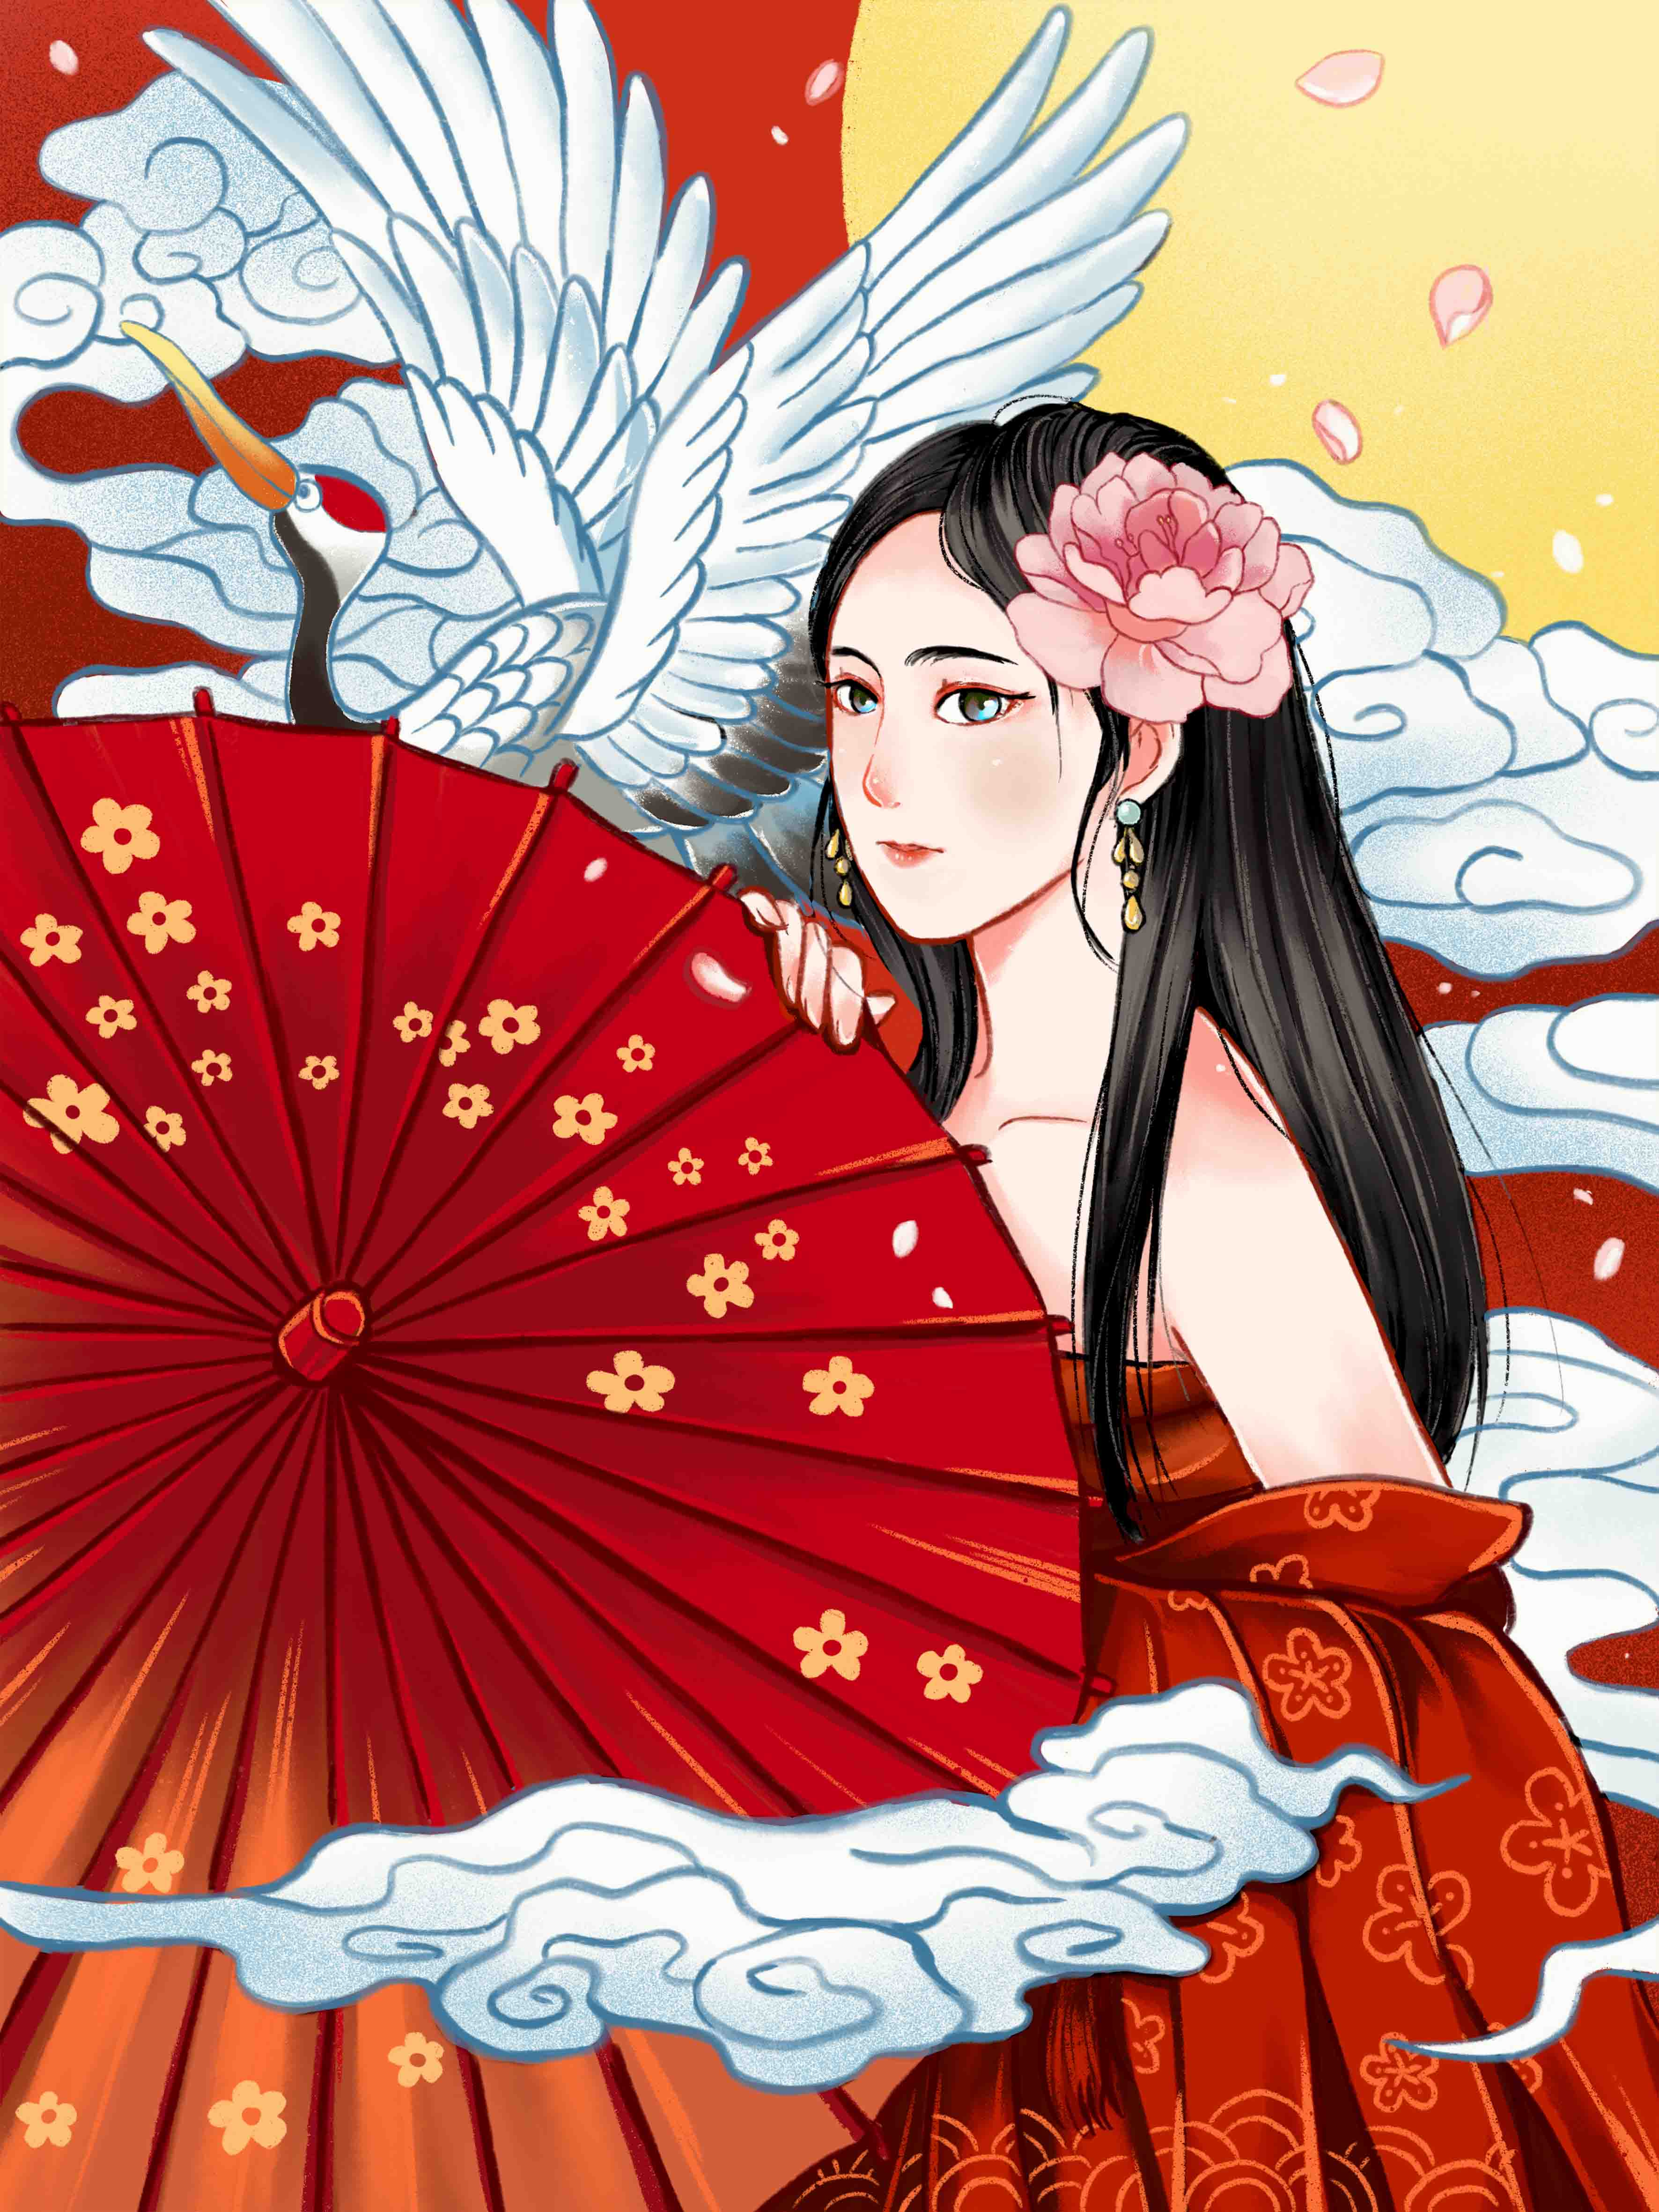 I0101024QTW原创手绘插画国潮汉服雨伞仙鹤女孩.jpg